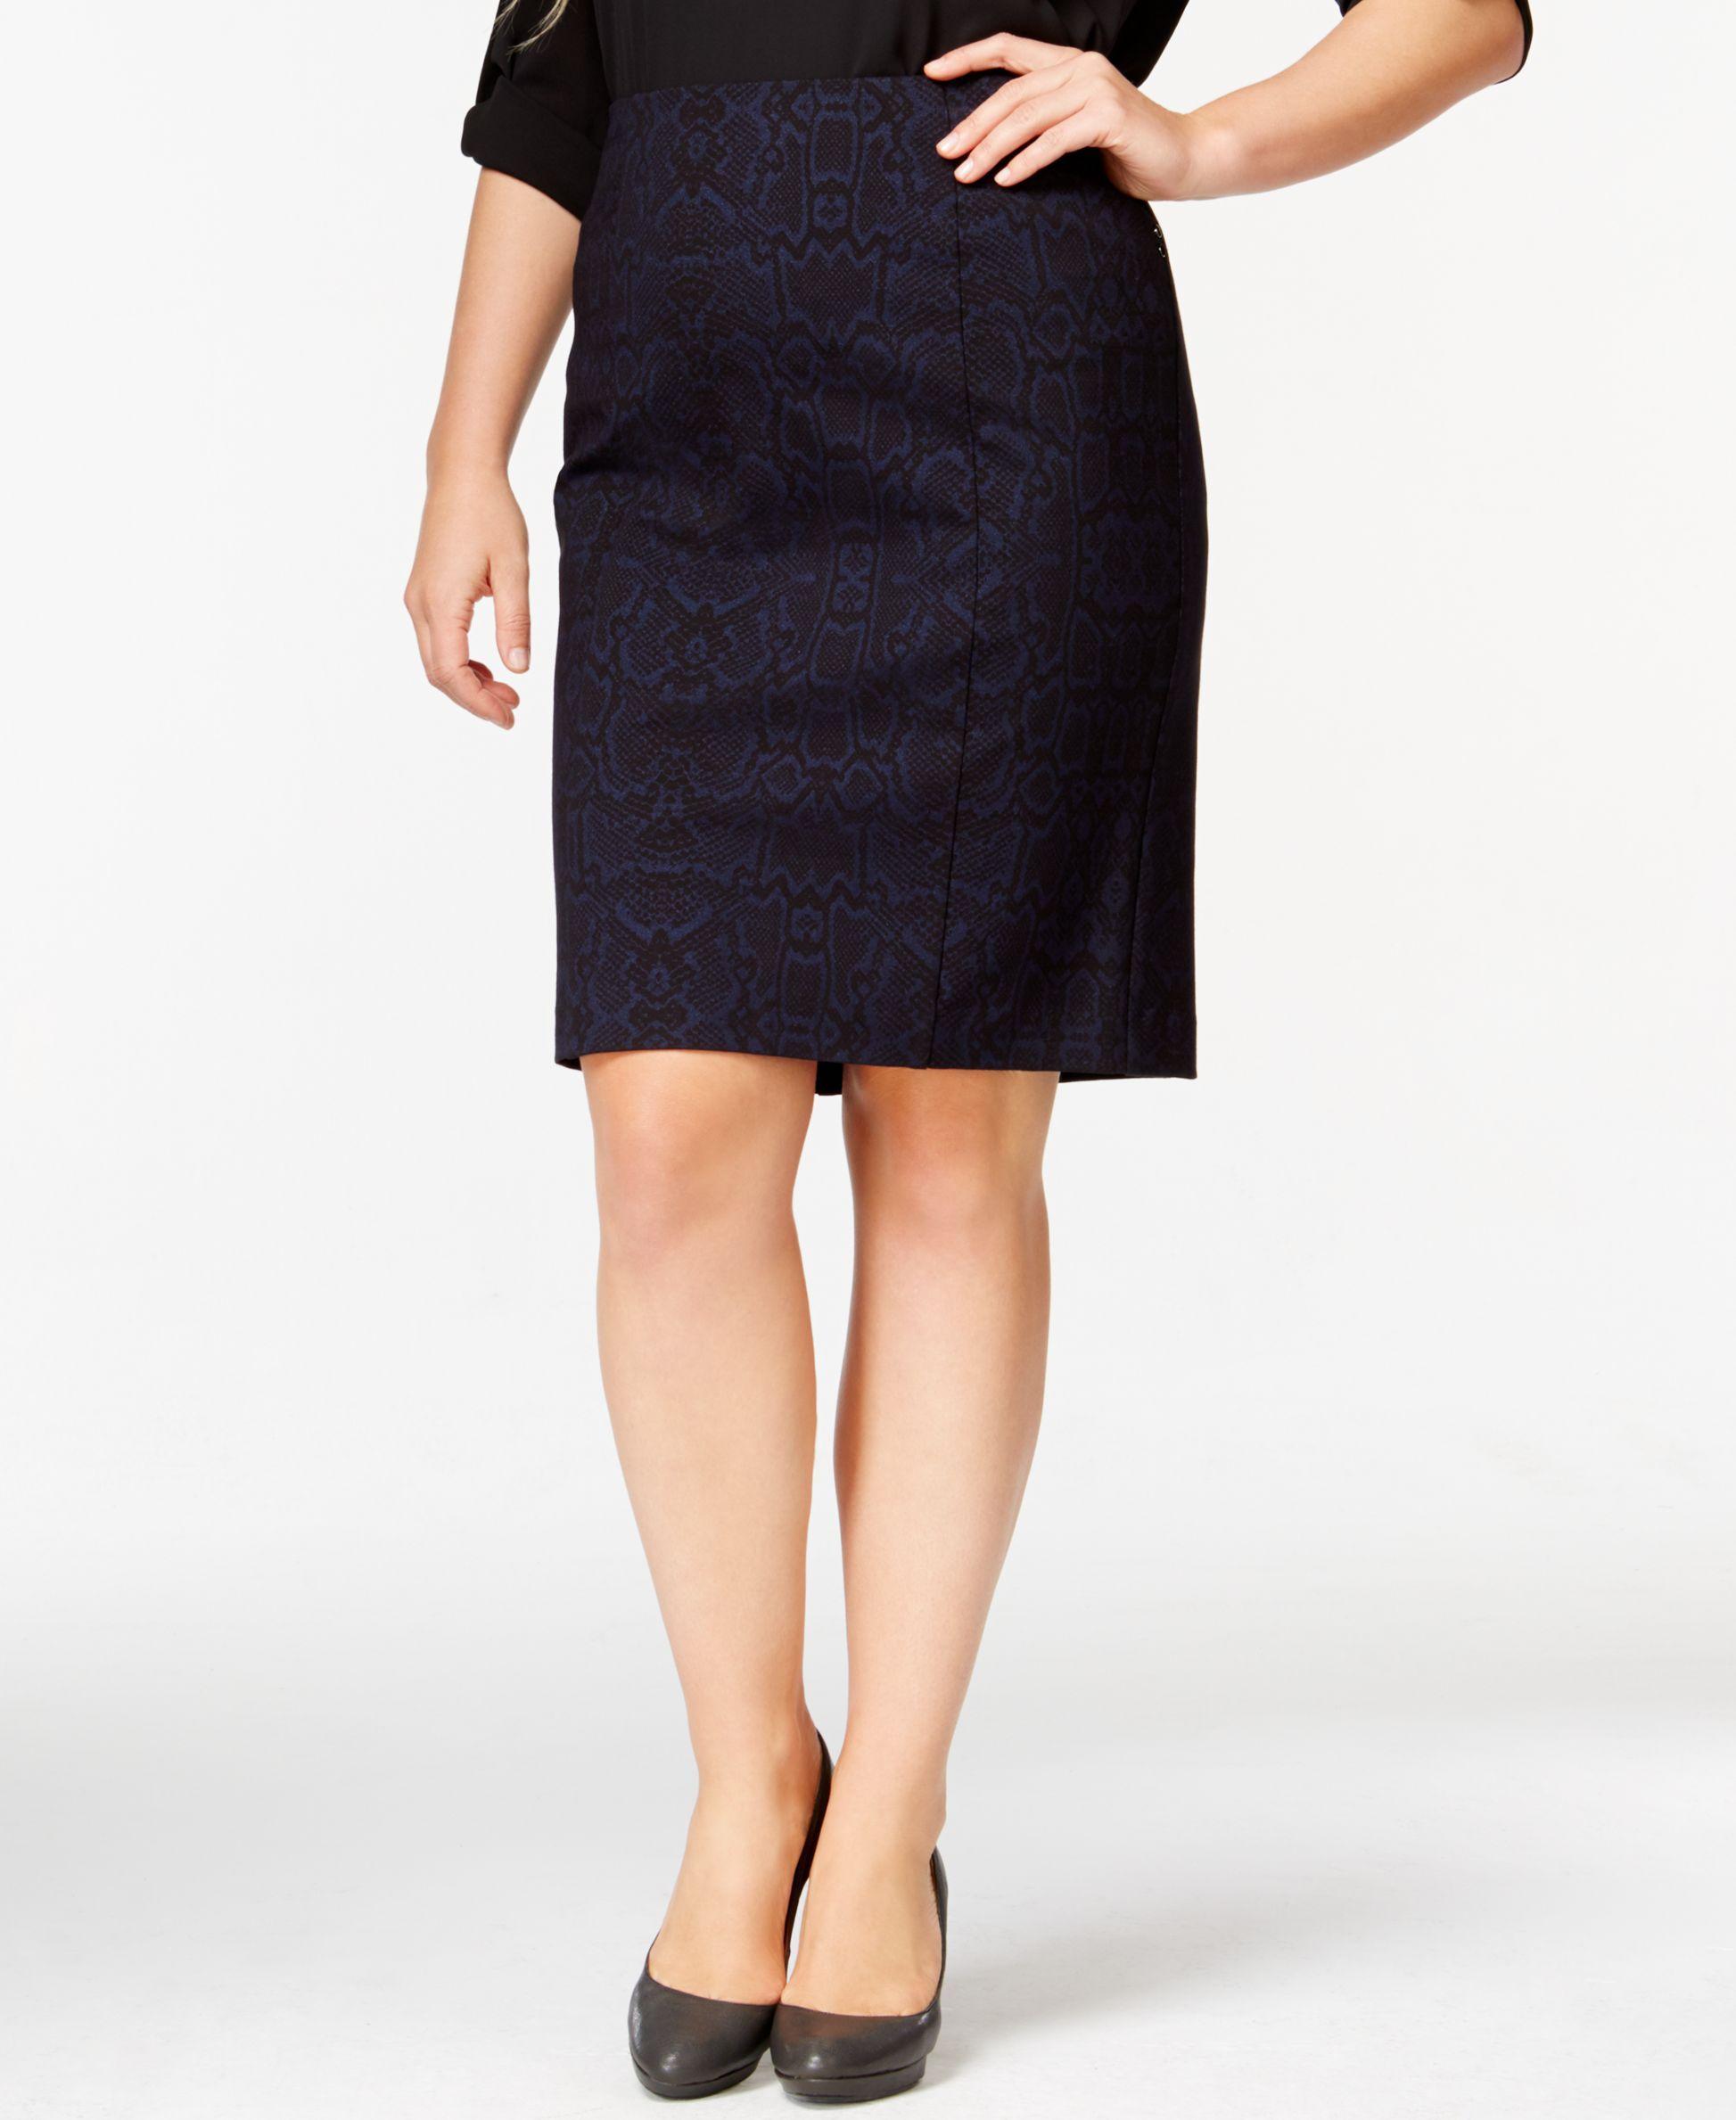 Plus Size Skirts At Macys | Huston Fislar Photography